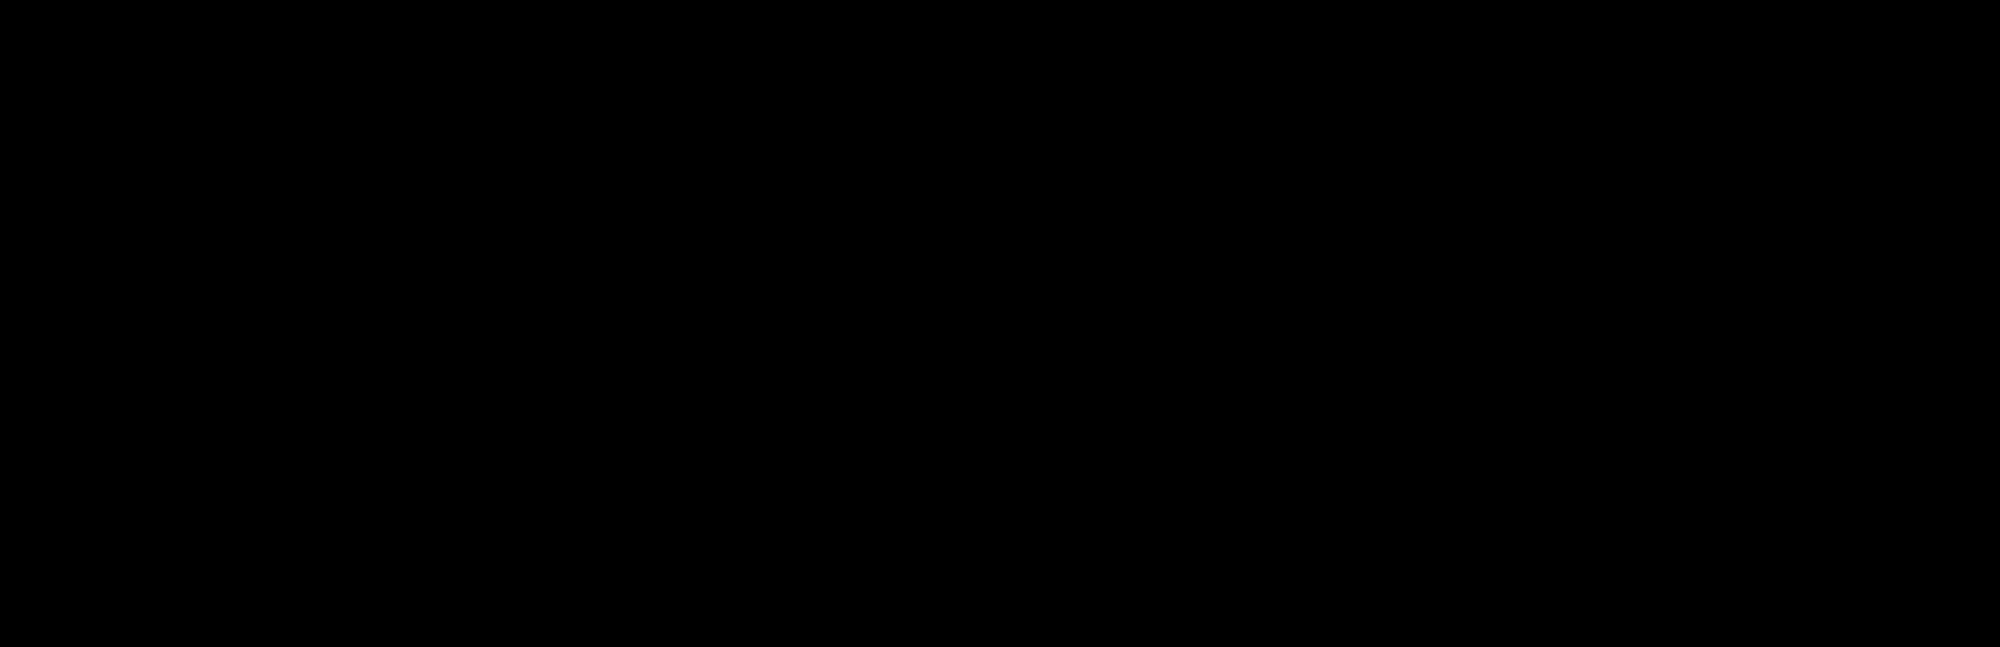 File skyline title wikimedia. Cityscape clipart svg